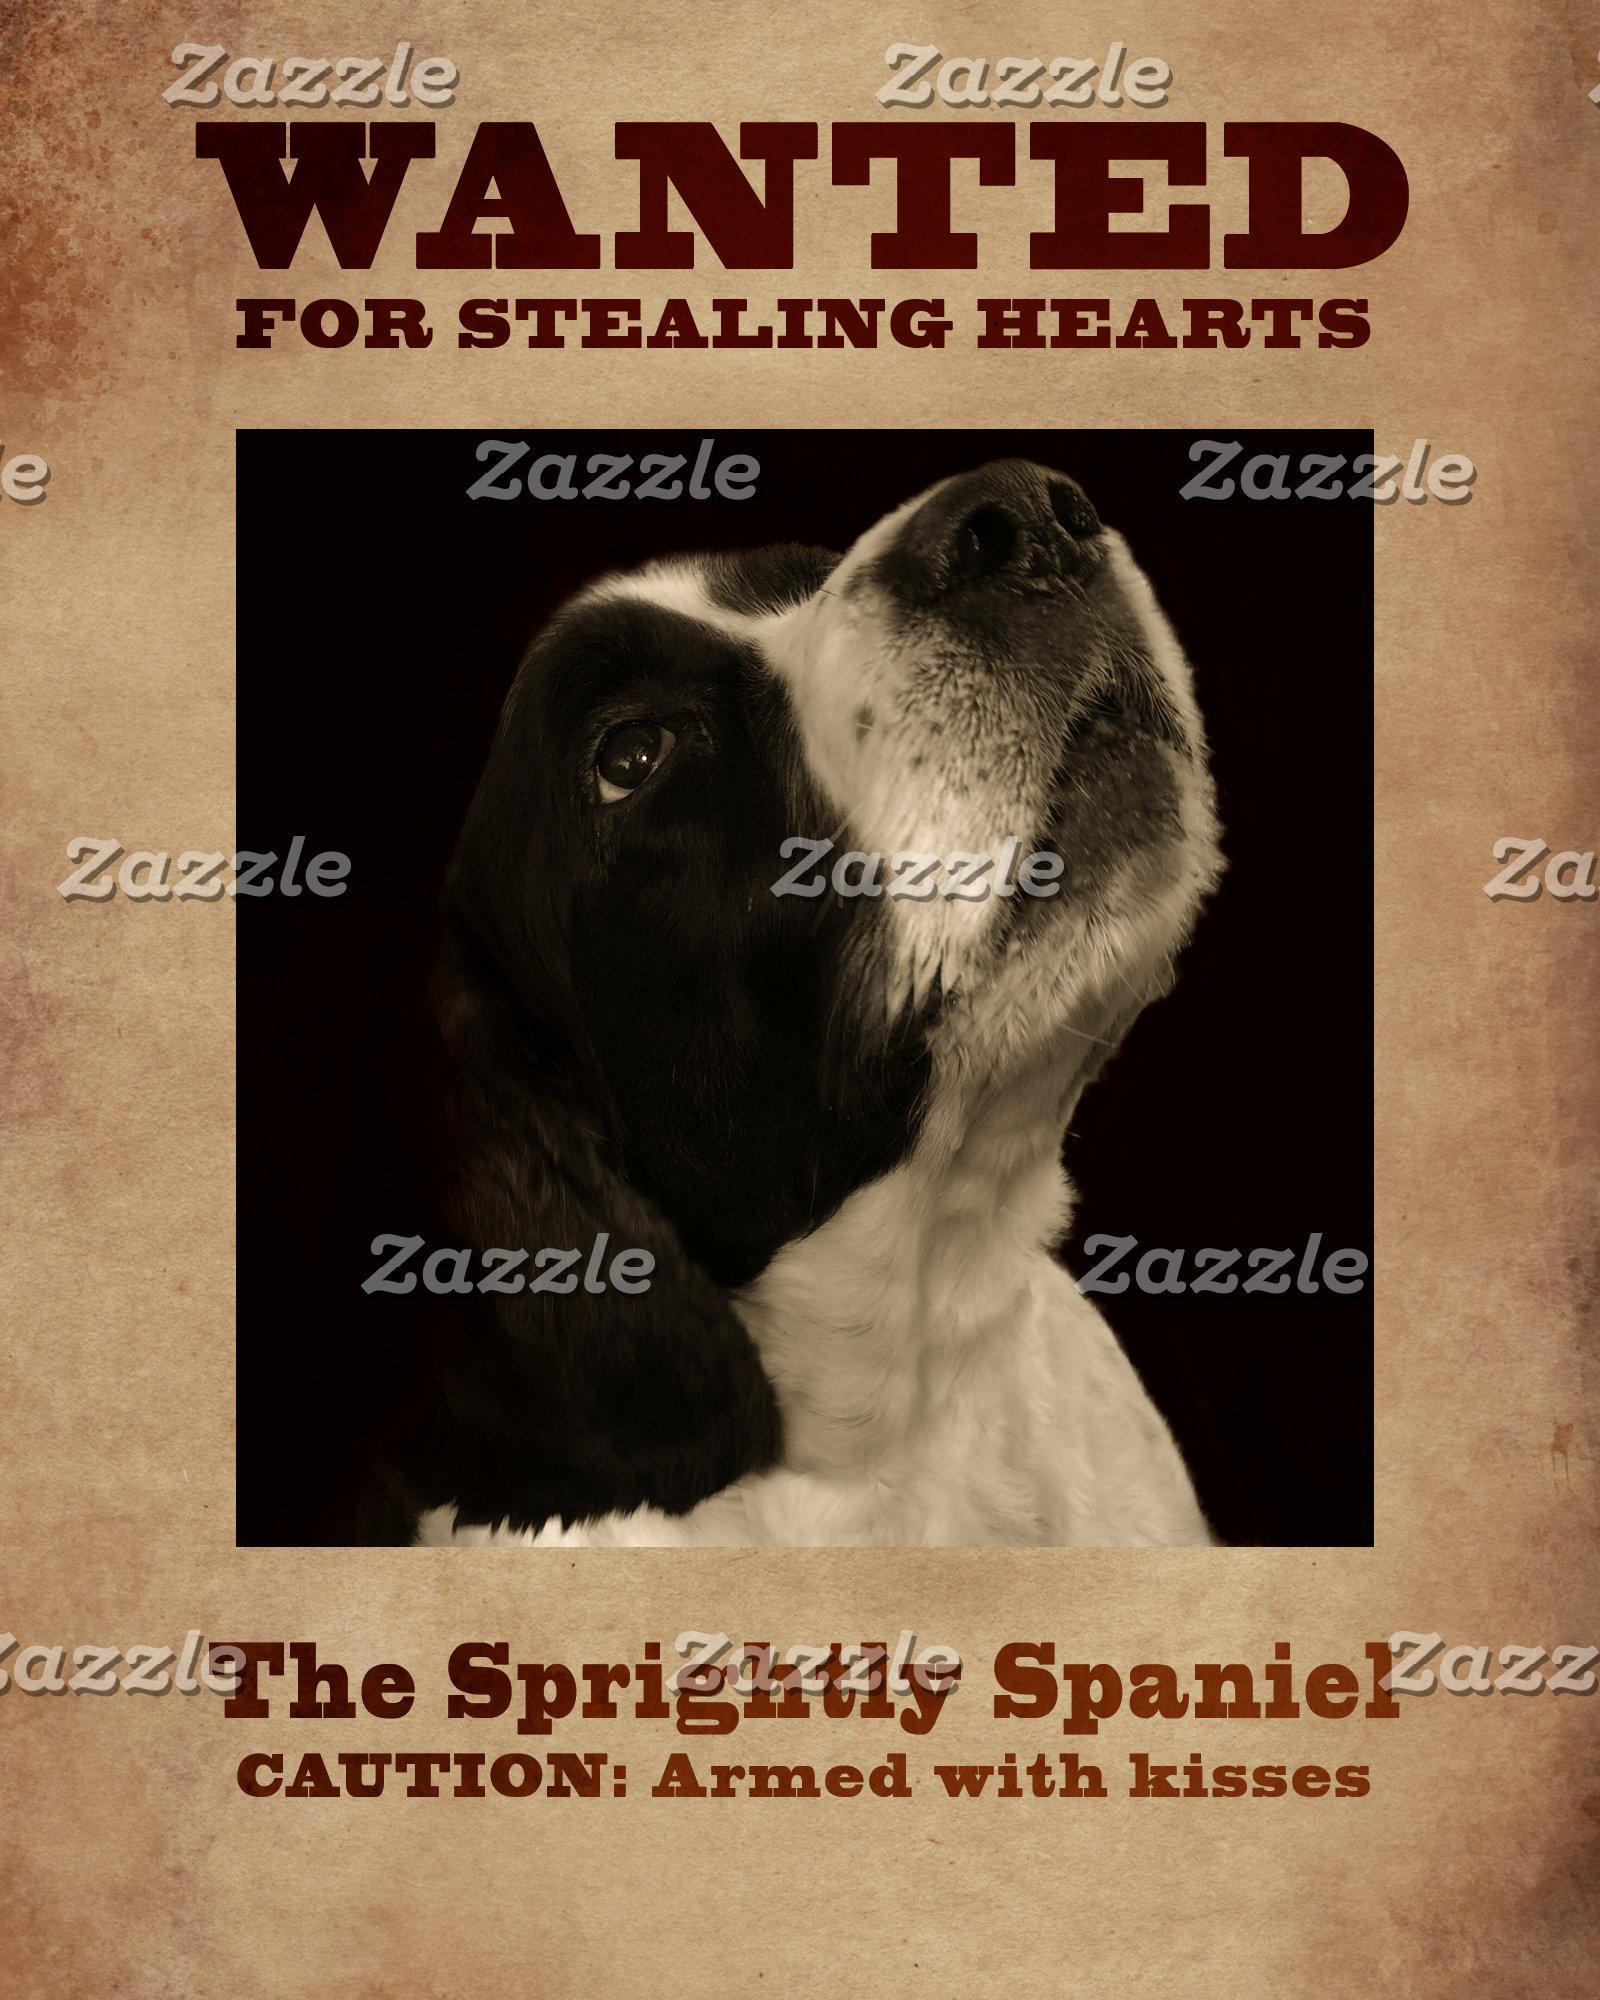 The Sprightly Spaniel